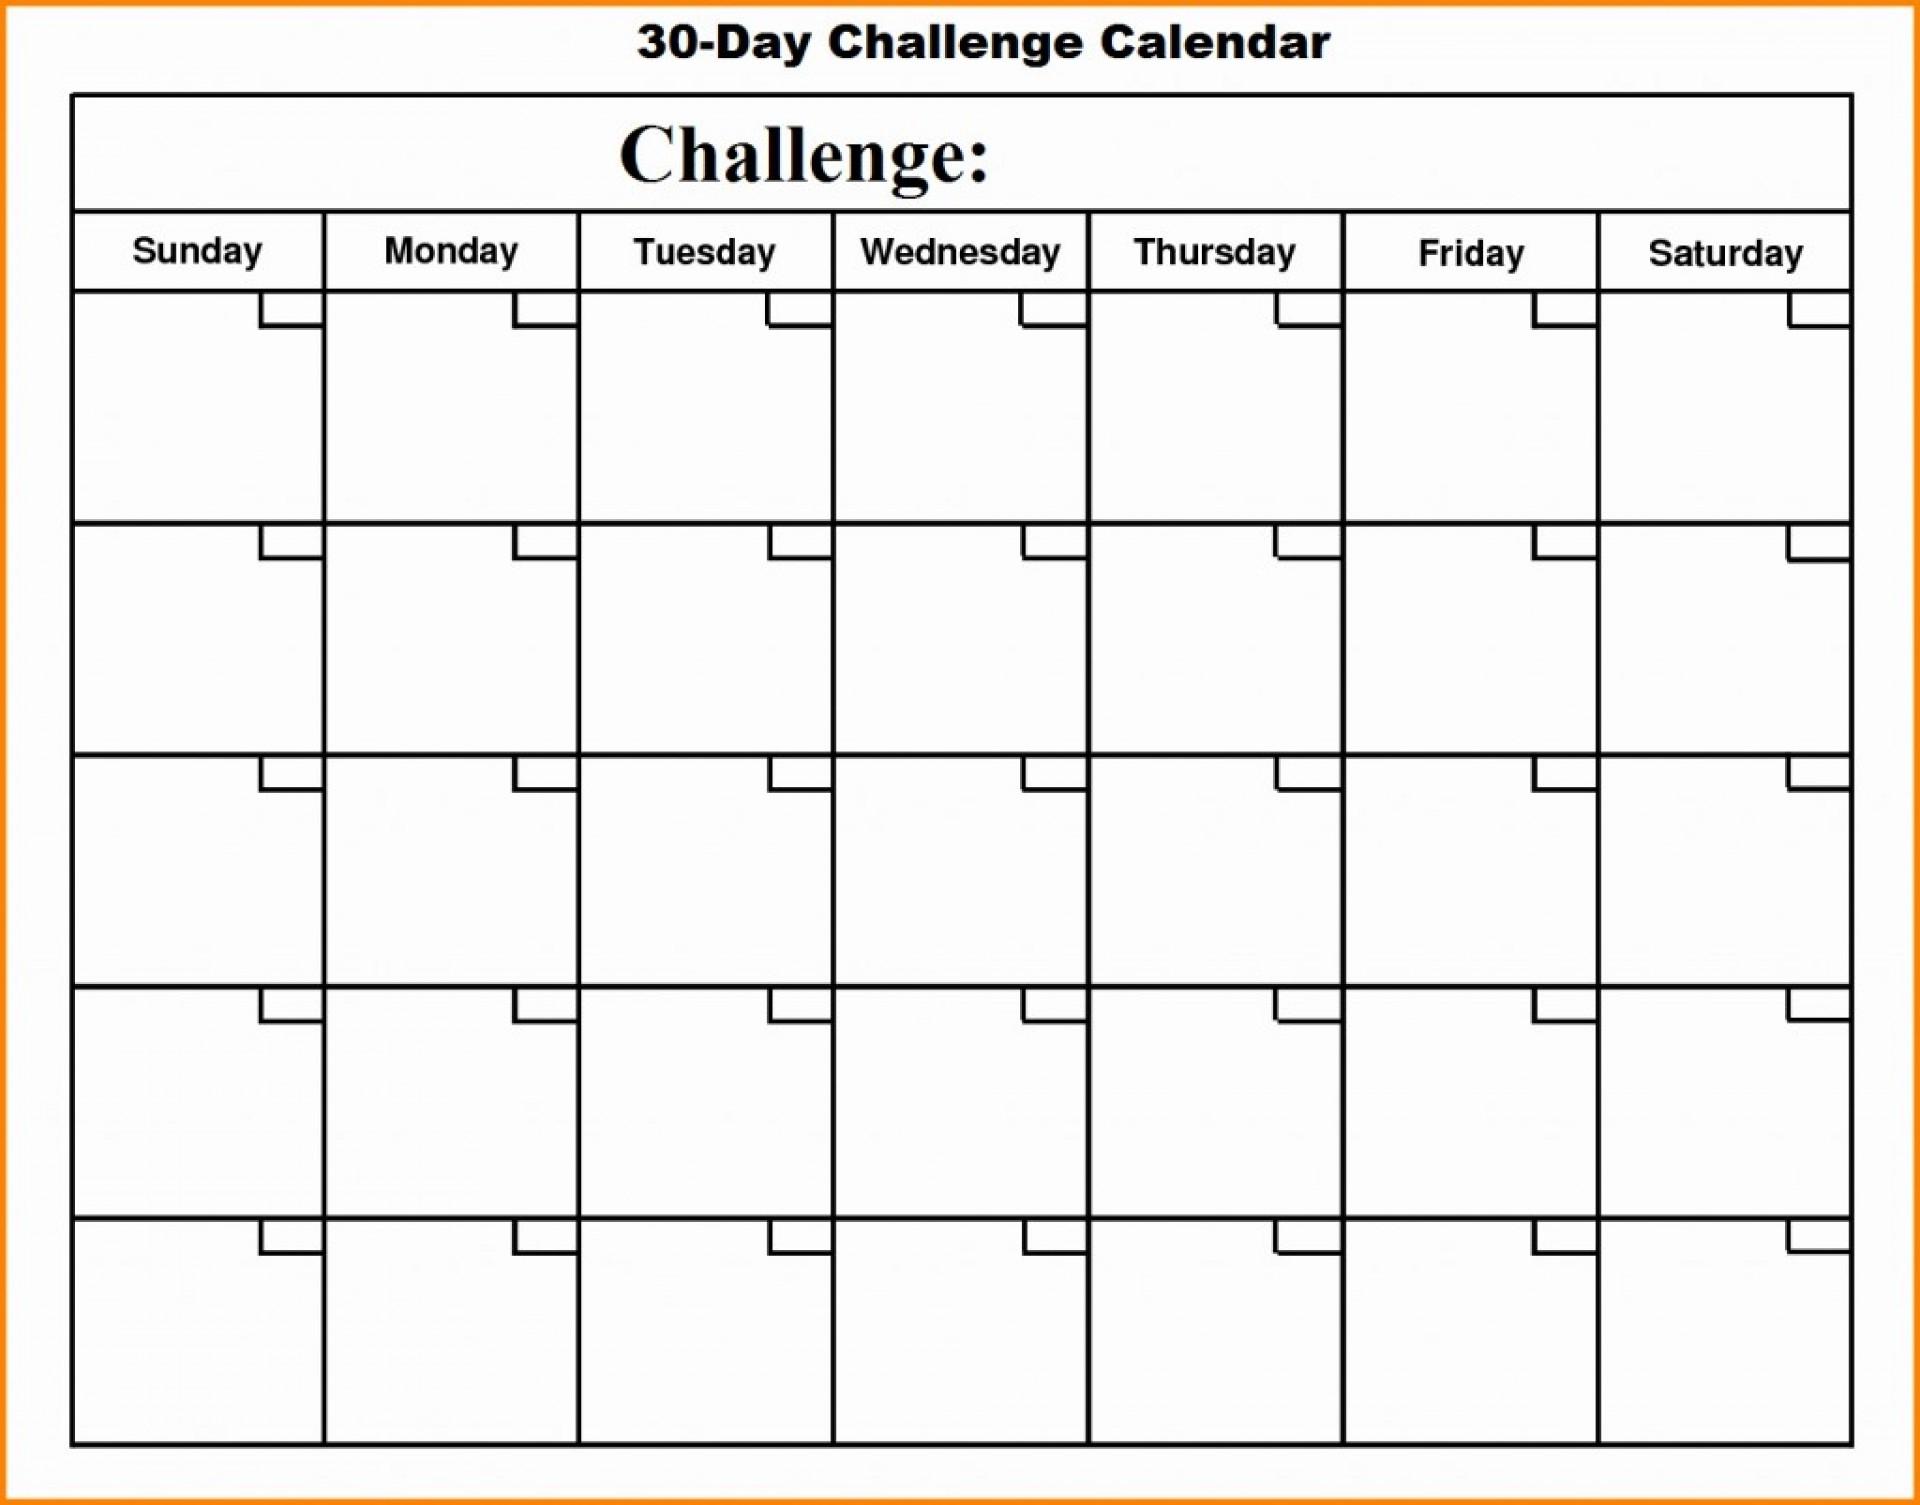 014 Template Ideas Days Blank Calendar Bold Day Striking 30 with 30 Day Blank Calendar